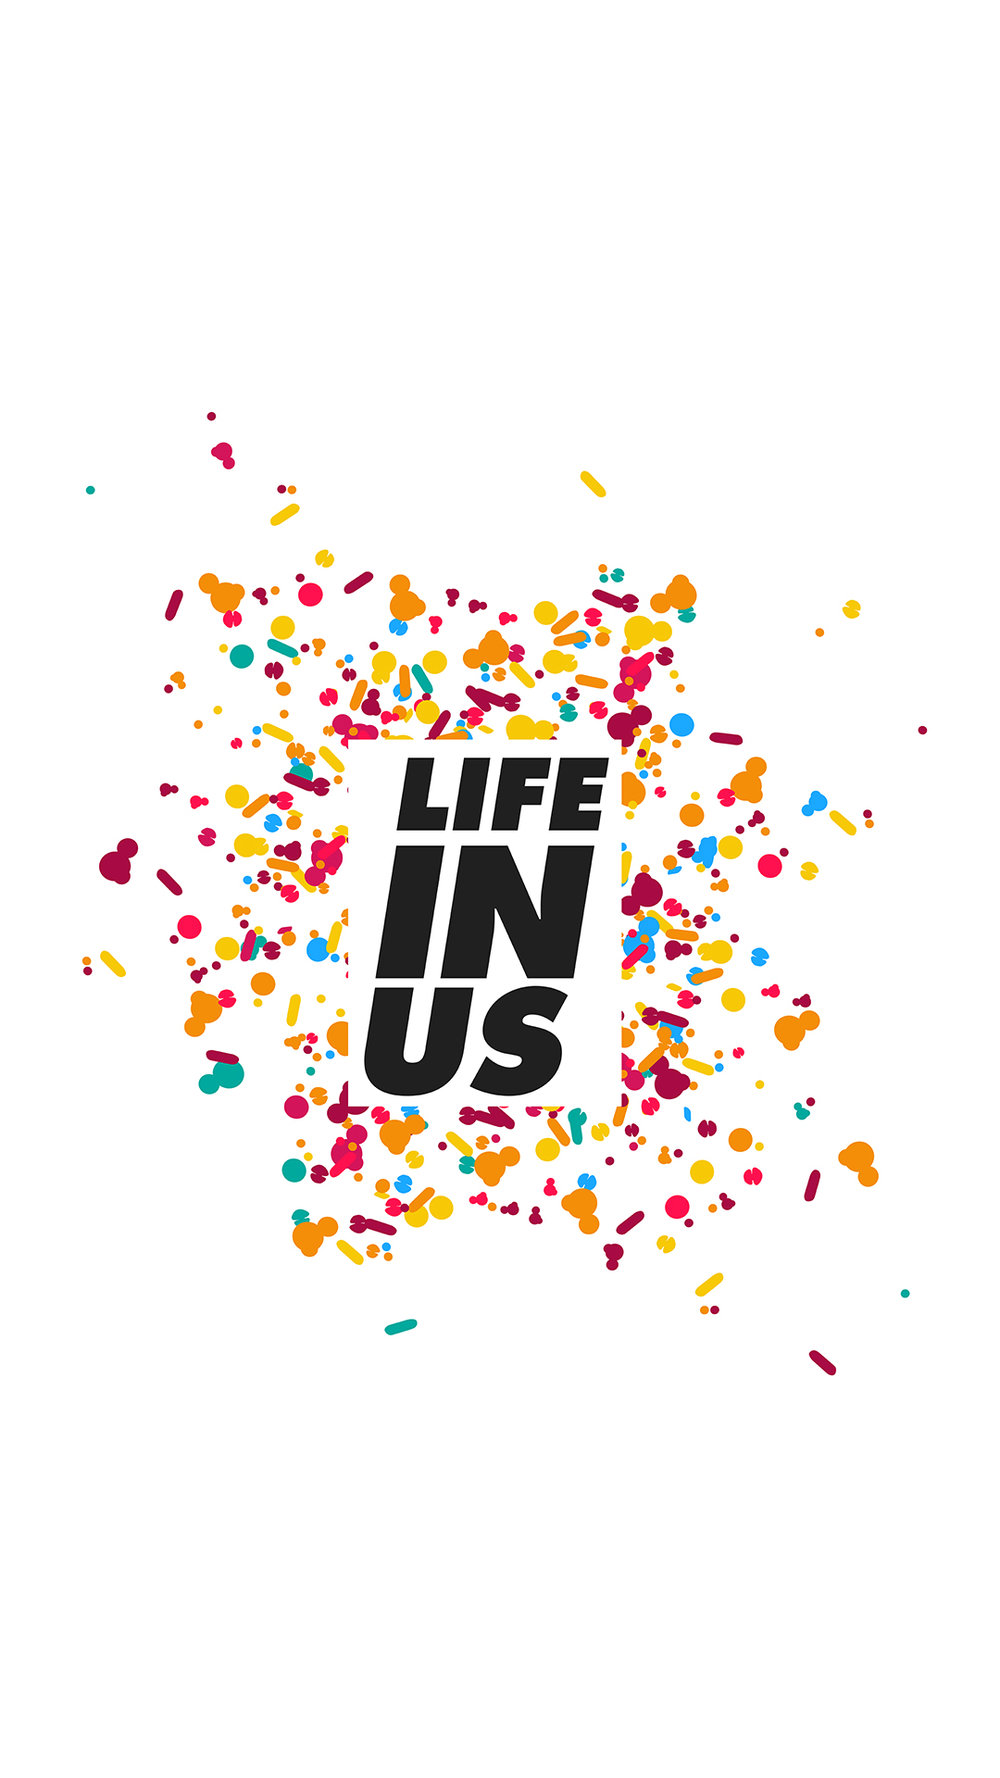 LifeInUs-Wallpaper.jpg